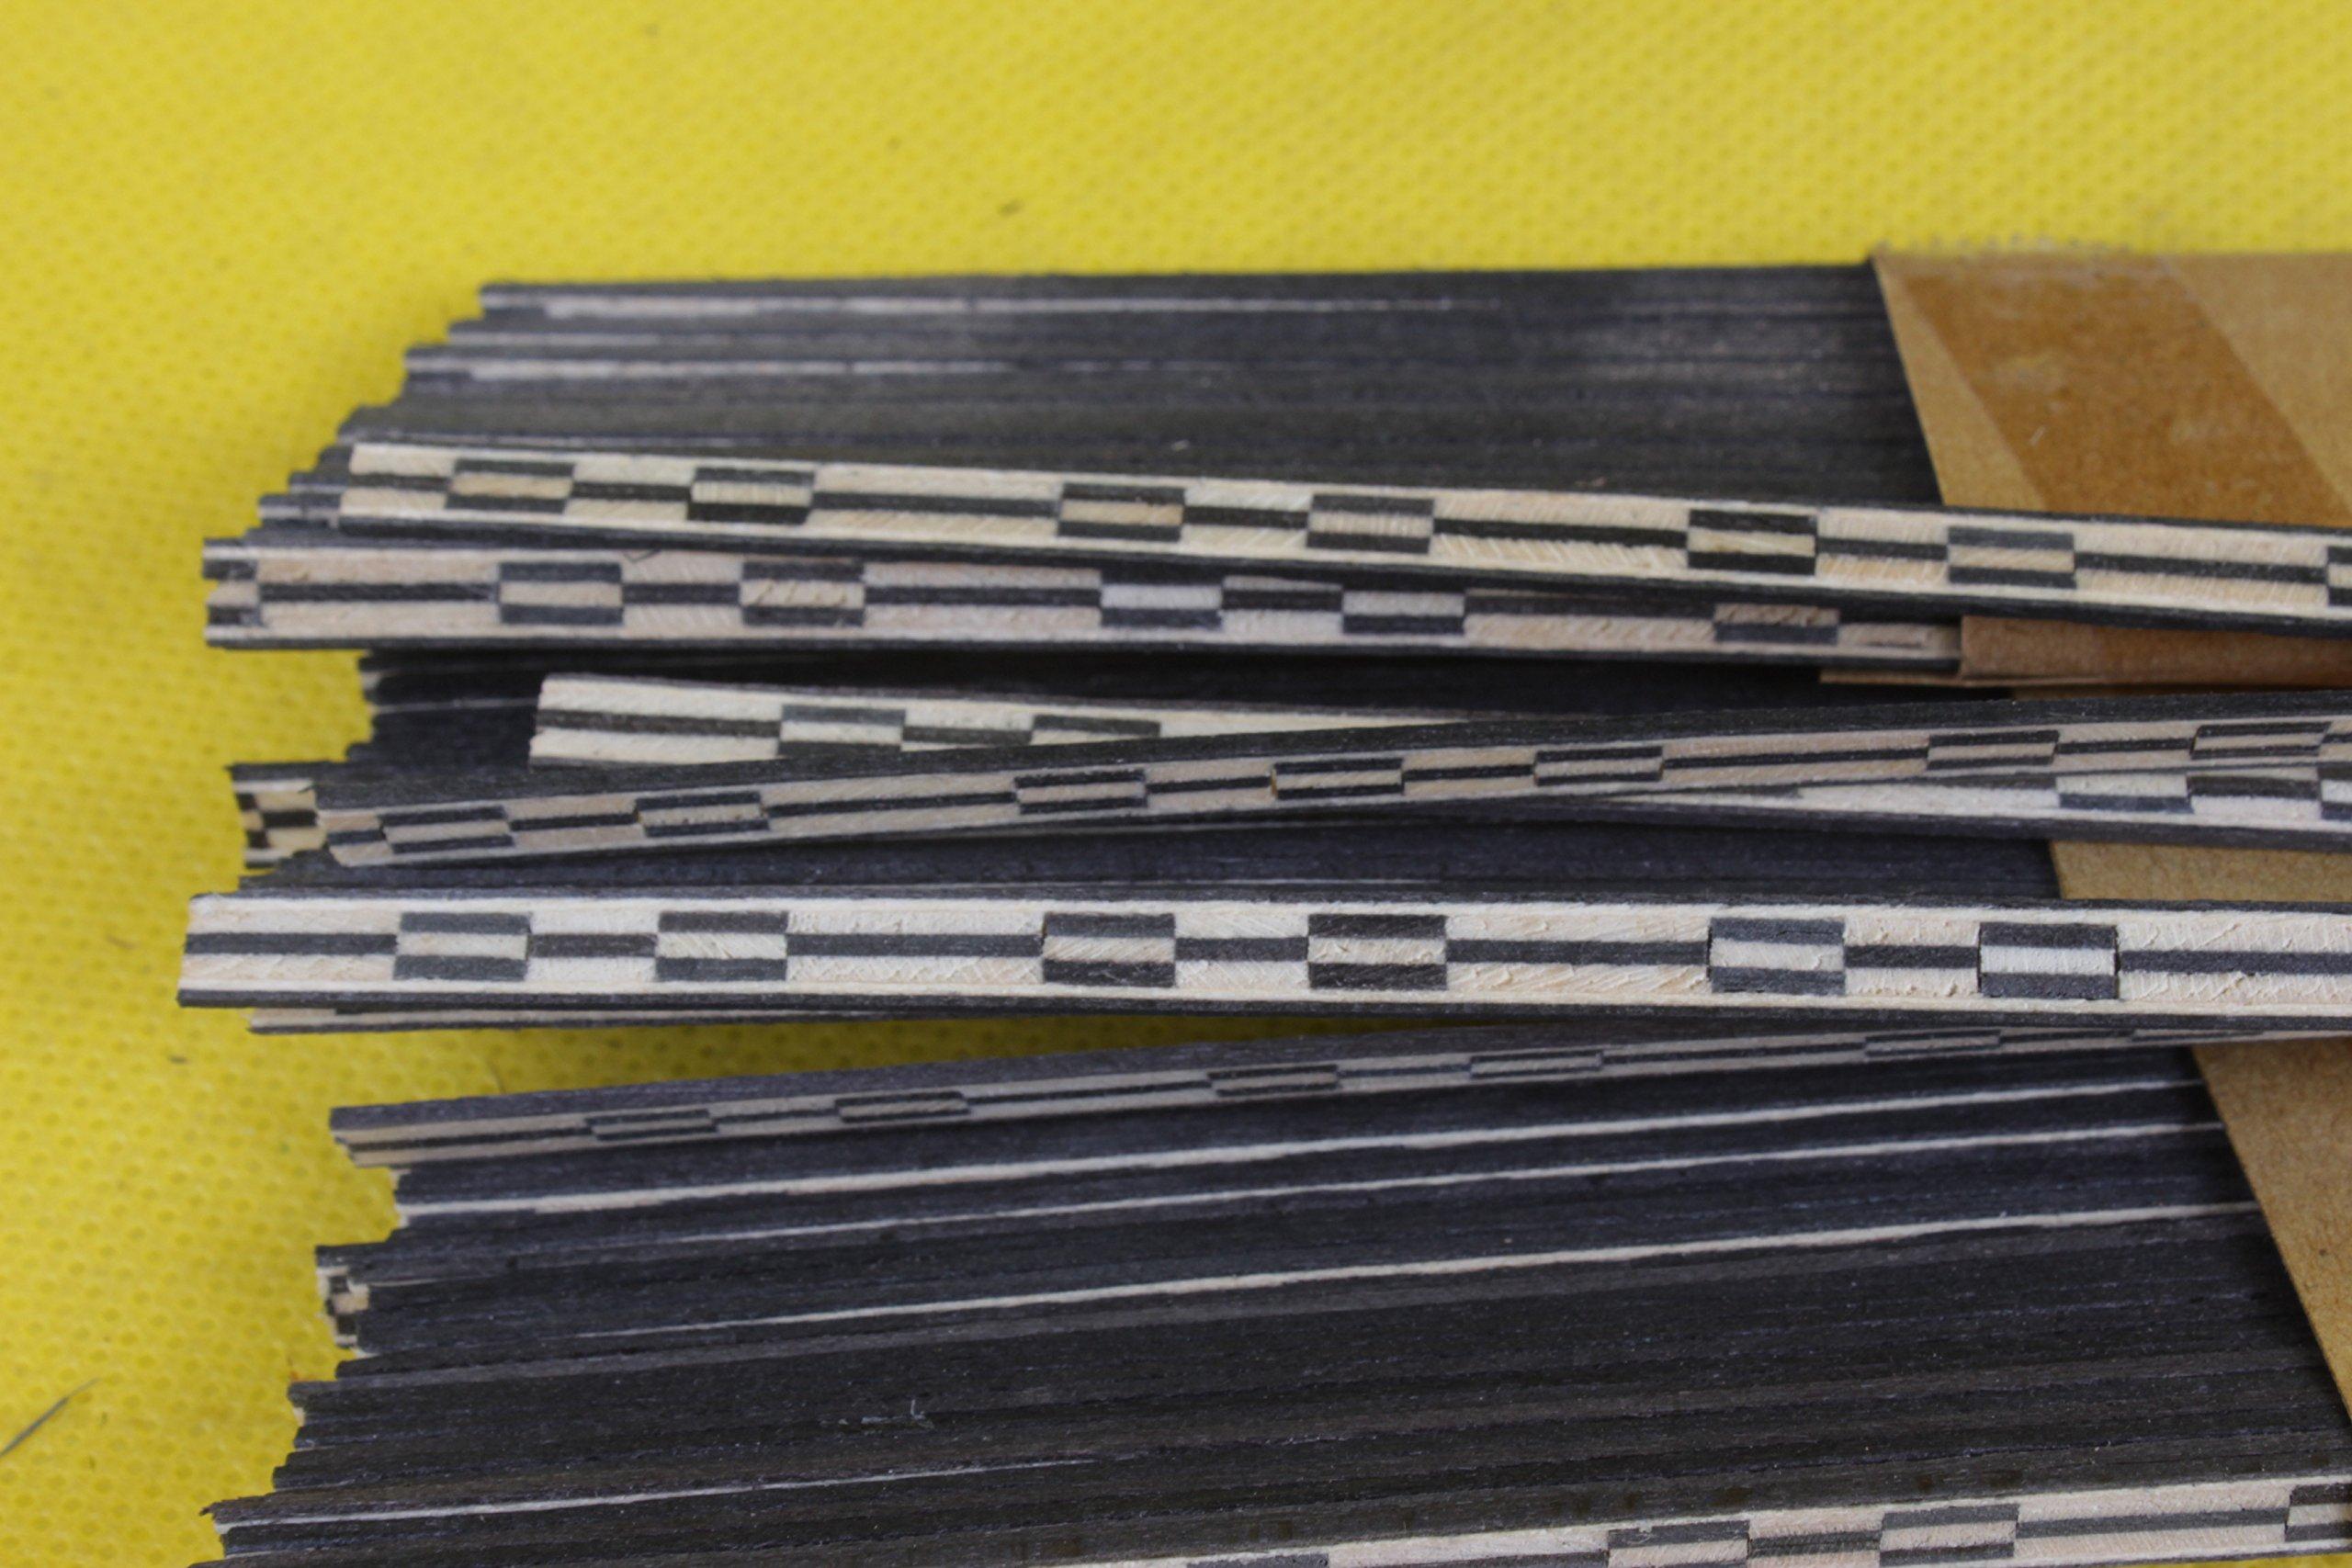 Yinfente 20x Guitar Strip Inlay guitar Luthier Figured Purfling Guitar Body Binding Wood Inlay 640x3x1.0mm #64